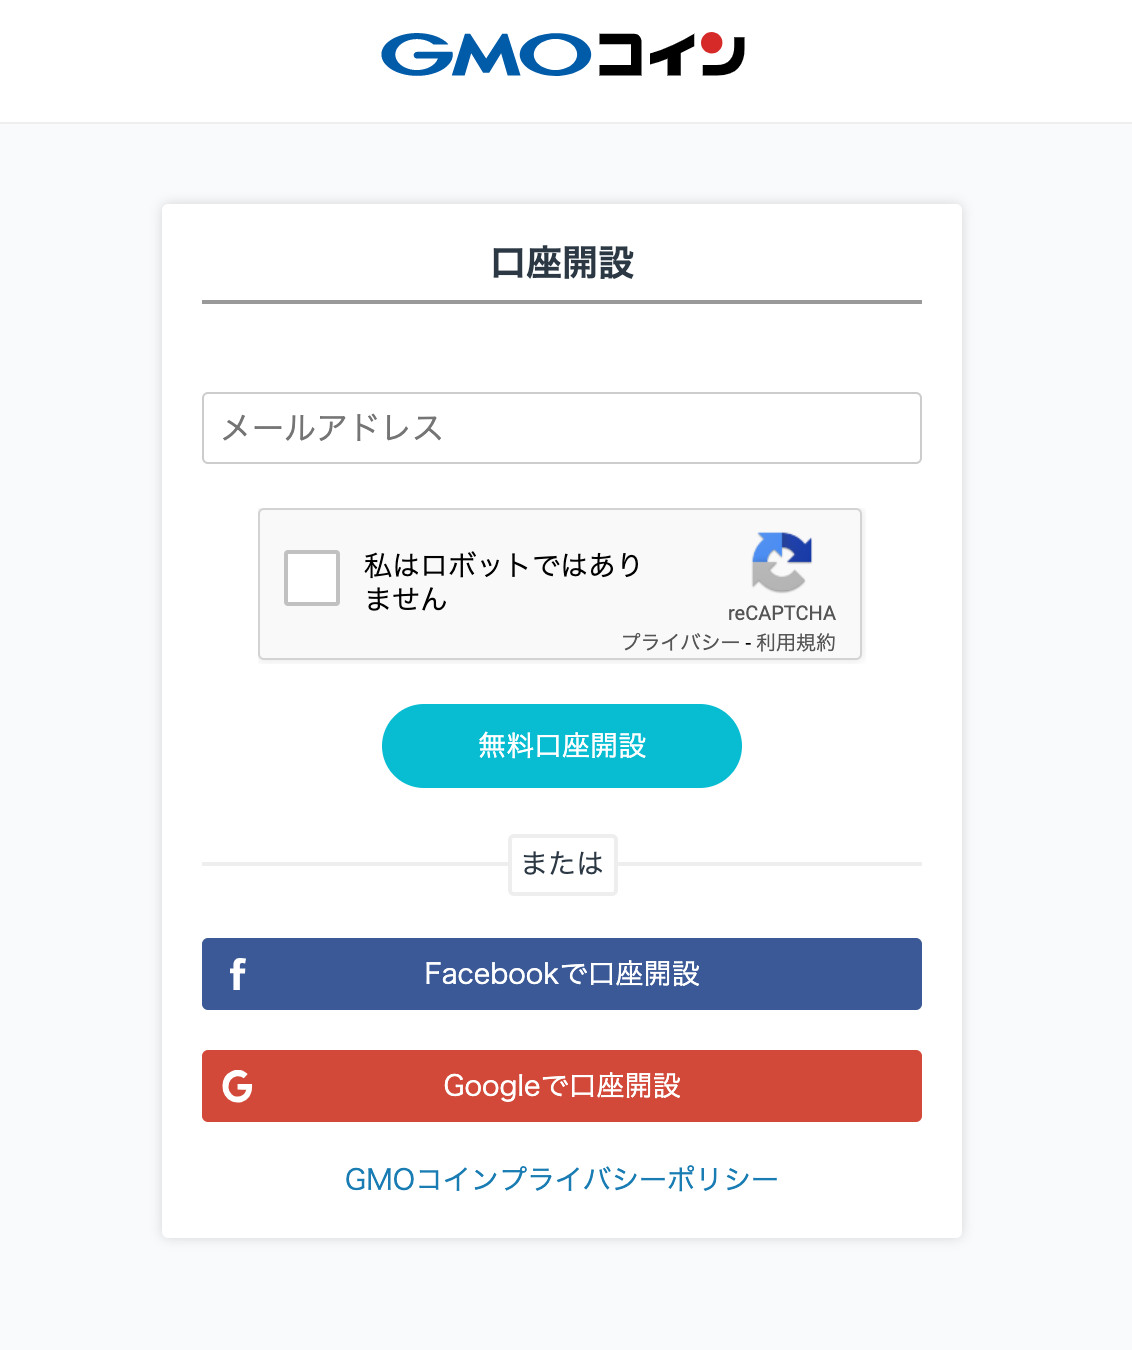 GMOコインのサイト登録フォーム